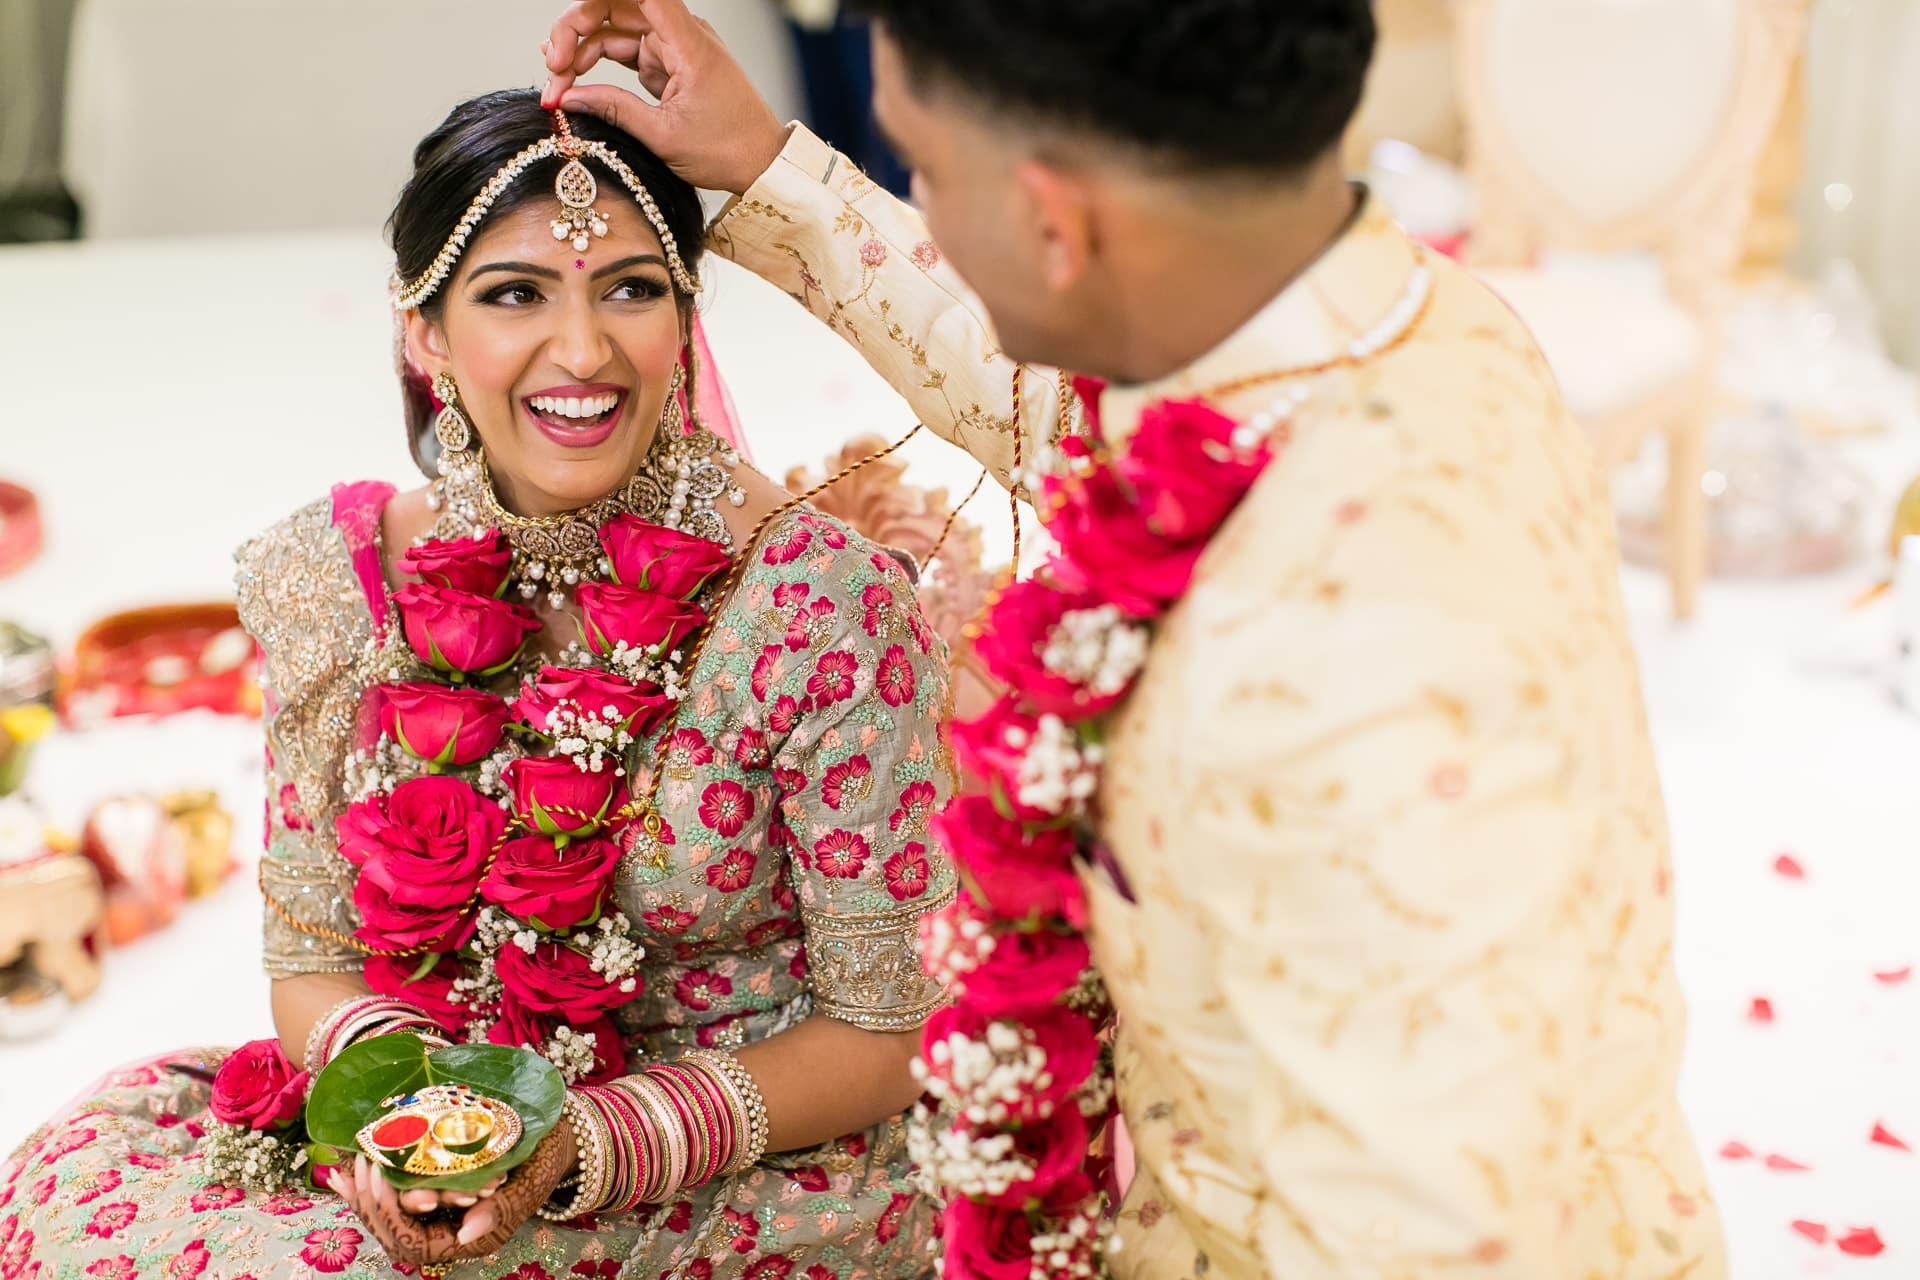 Groom placing sindoor into parting of bride's hair